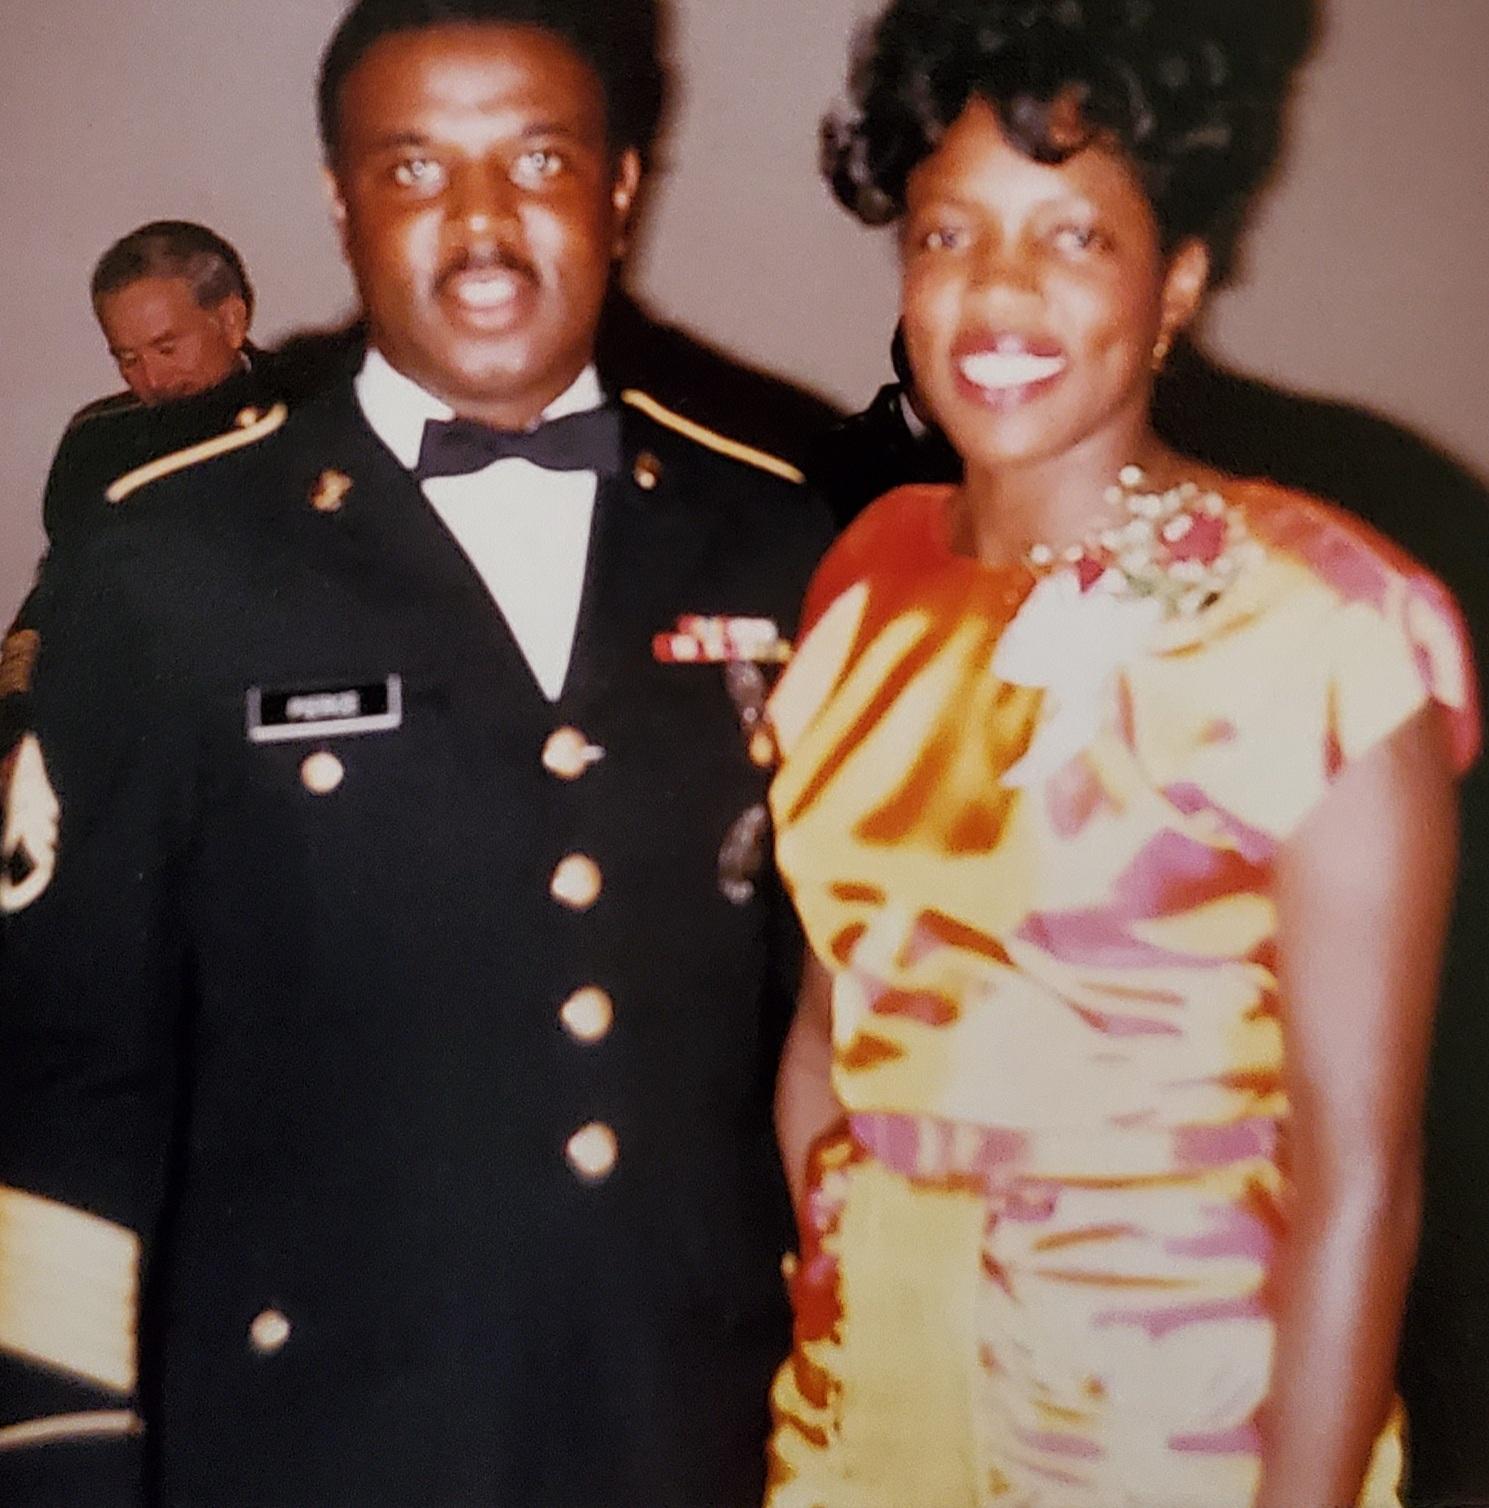 1985 U. S. Army Recruiting Command, Curtis Lee Pierce & Sharon Butts Pierce